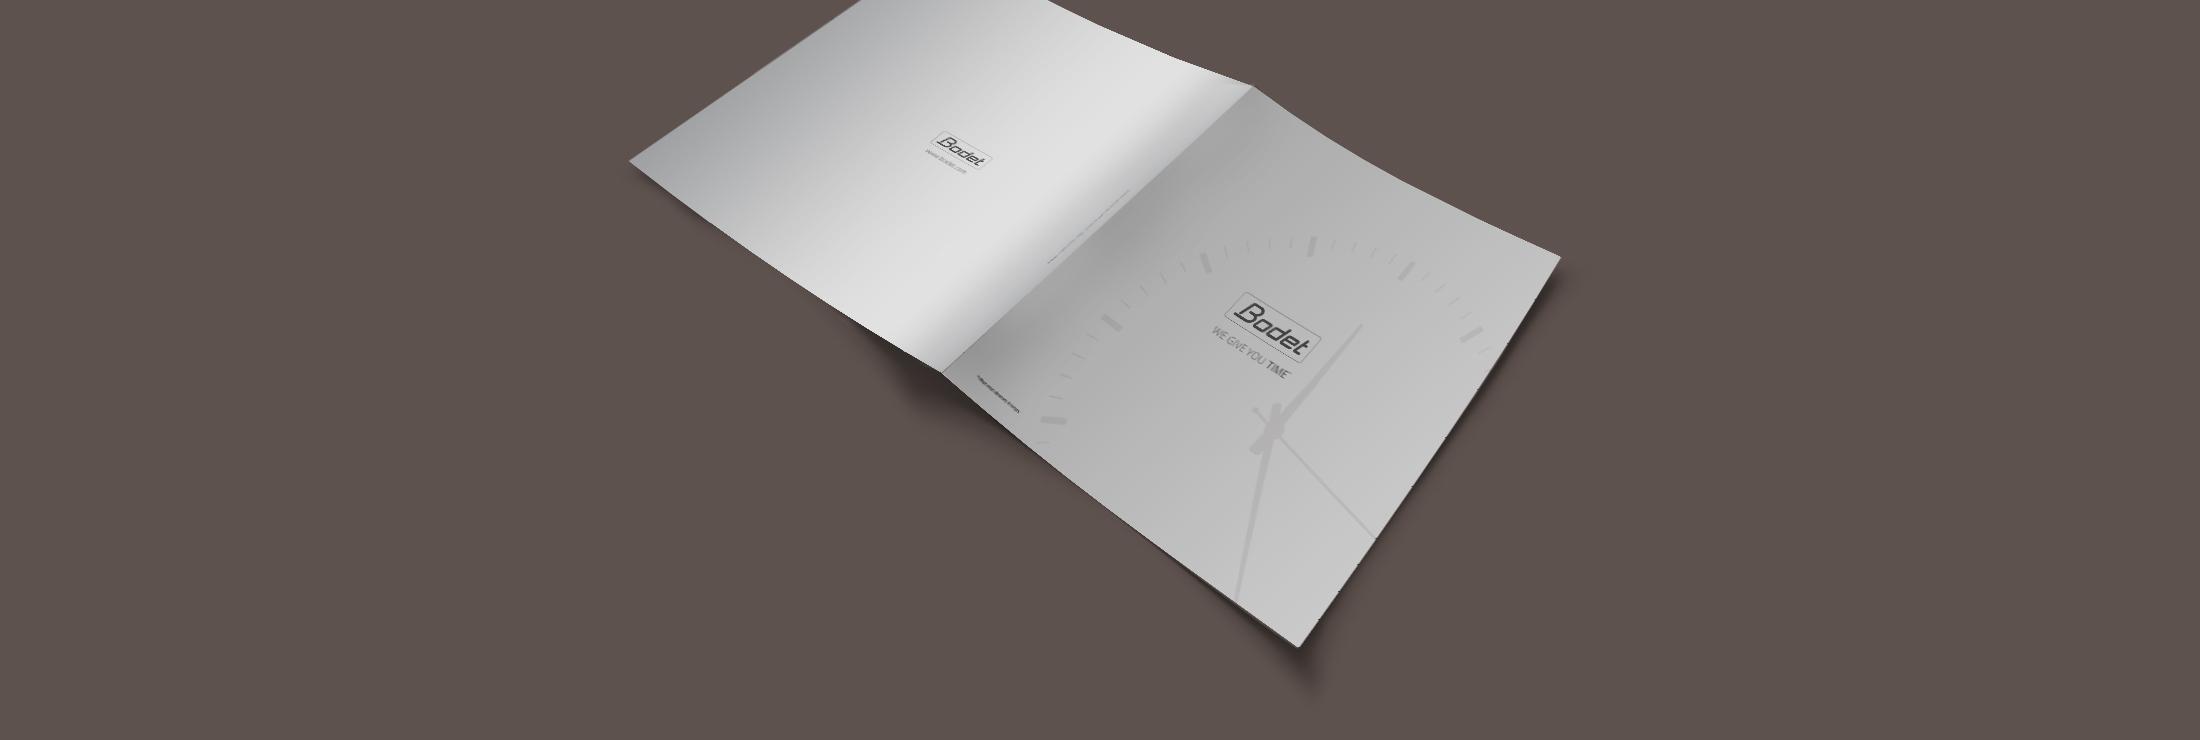 bodet-osb-communication-print-plaquette